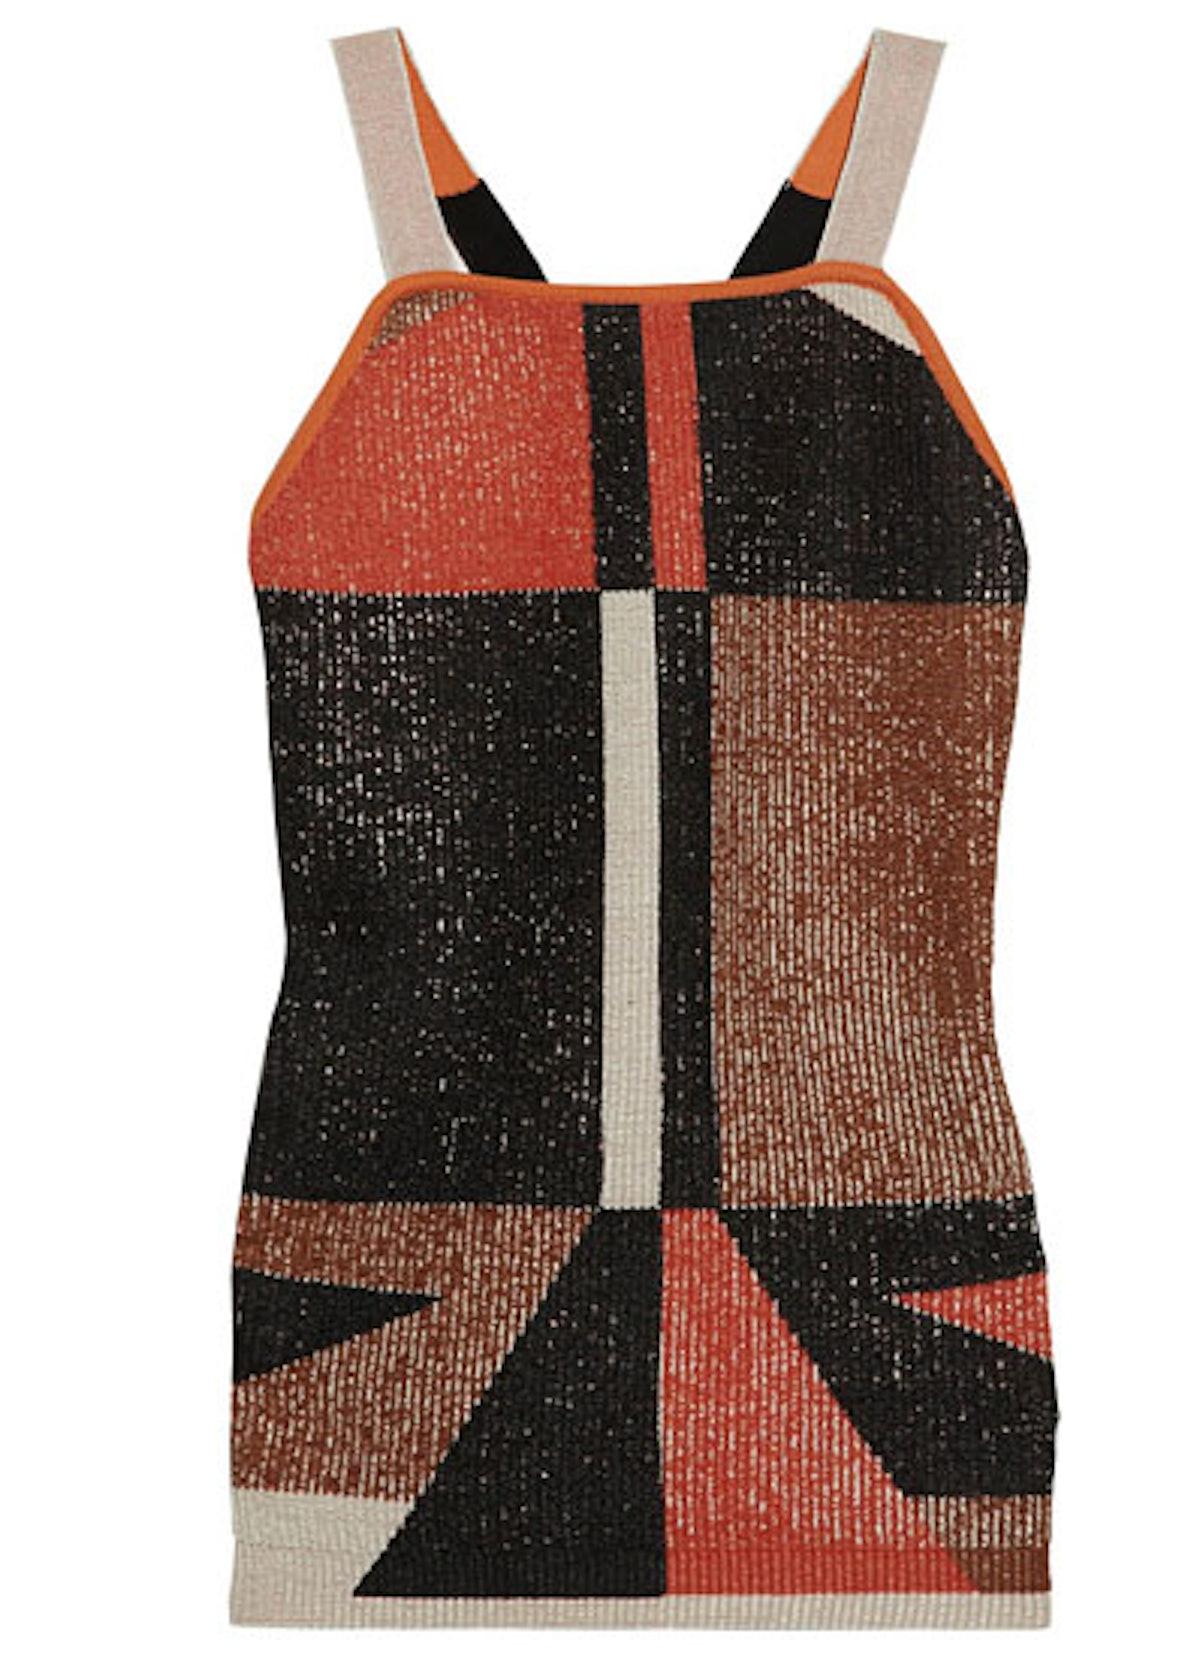 fass-graphic-knits-03-v.jpg